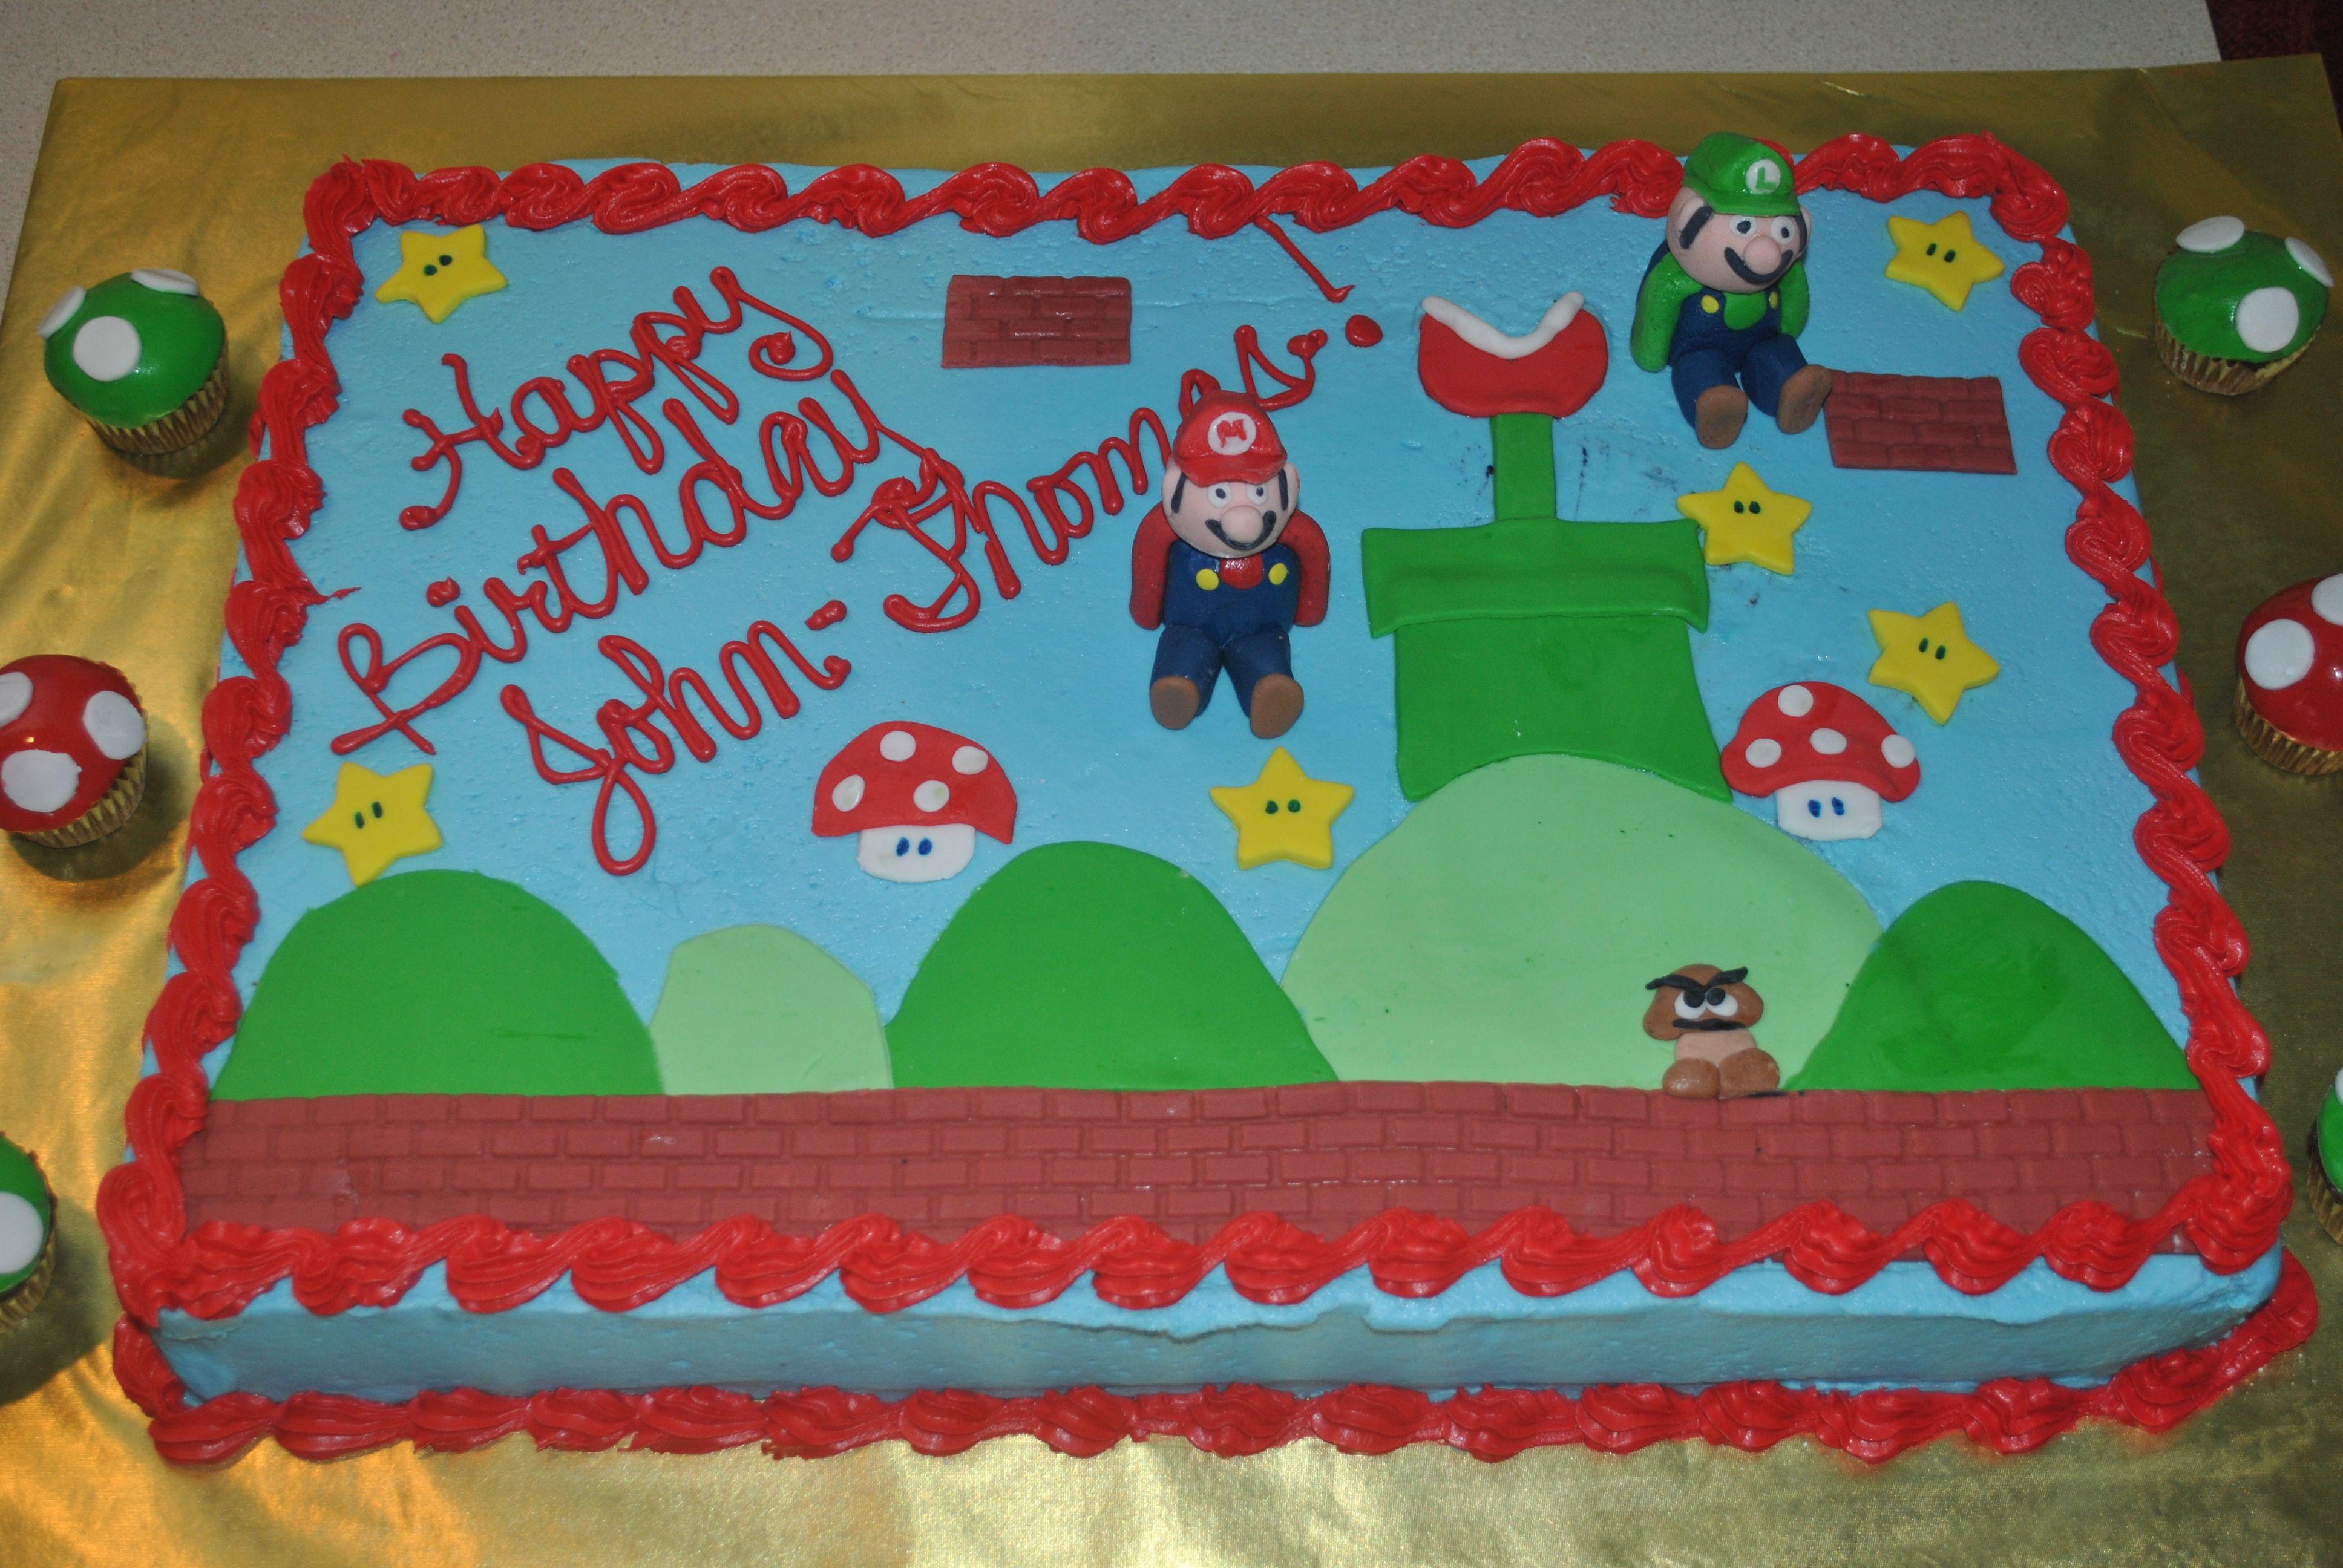 Mario Brothers Birthday Cake Mario And Luigi For A 3rd Birthday